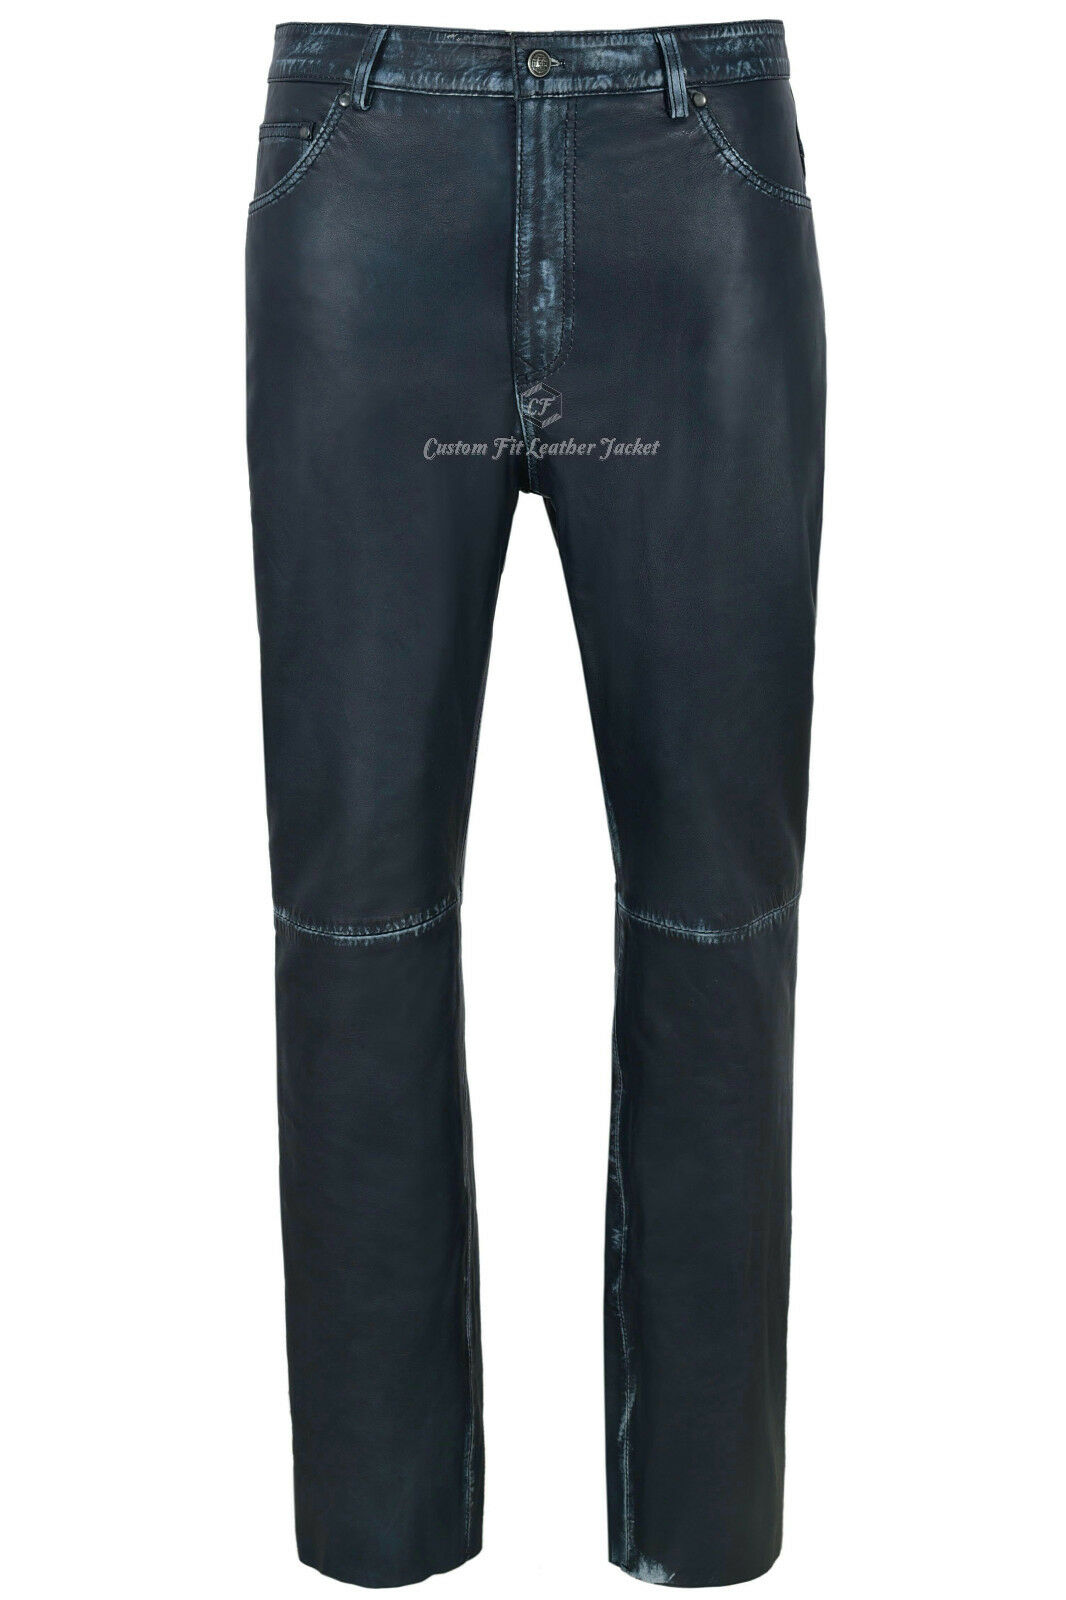 Men's Leather Trouser Navy Vintage Lambskin Leather Jean Motorcycle Style 501